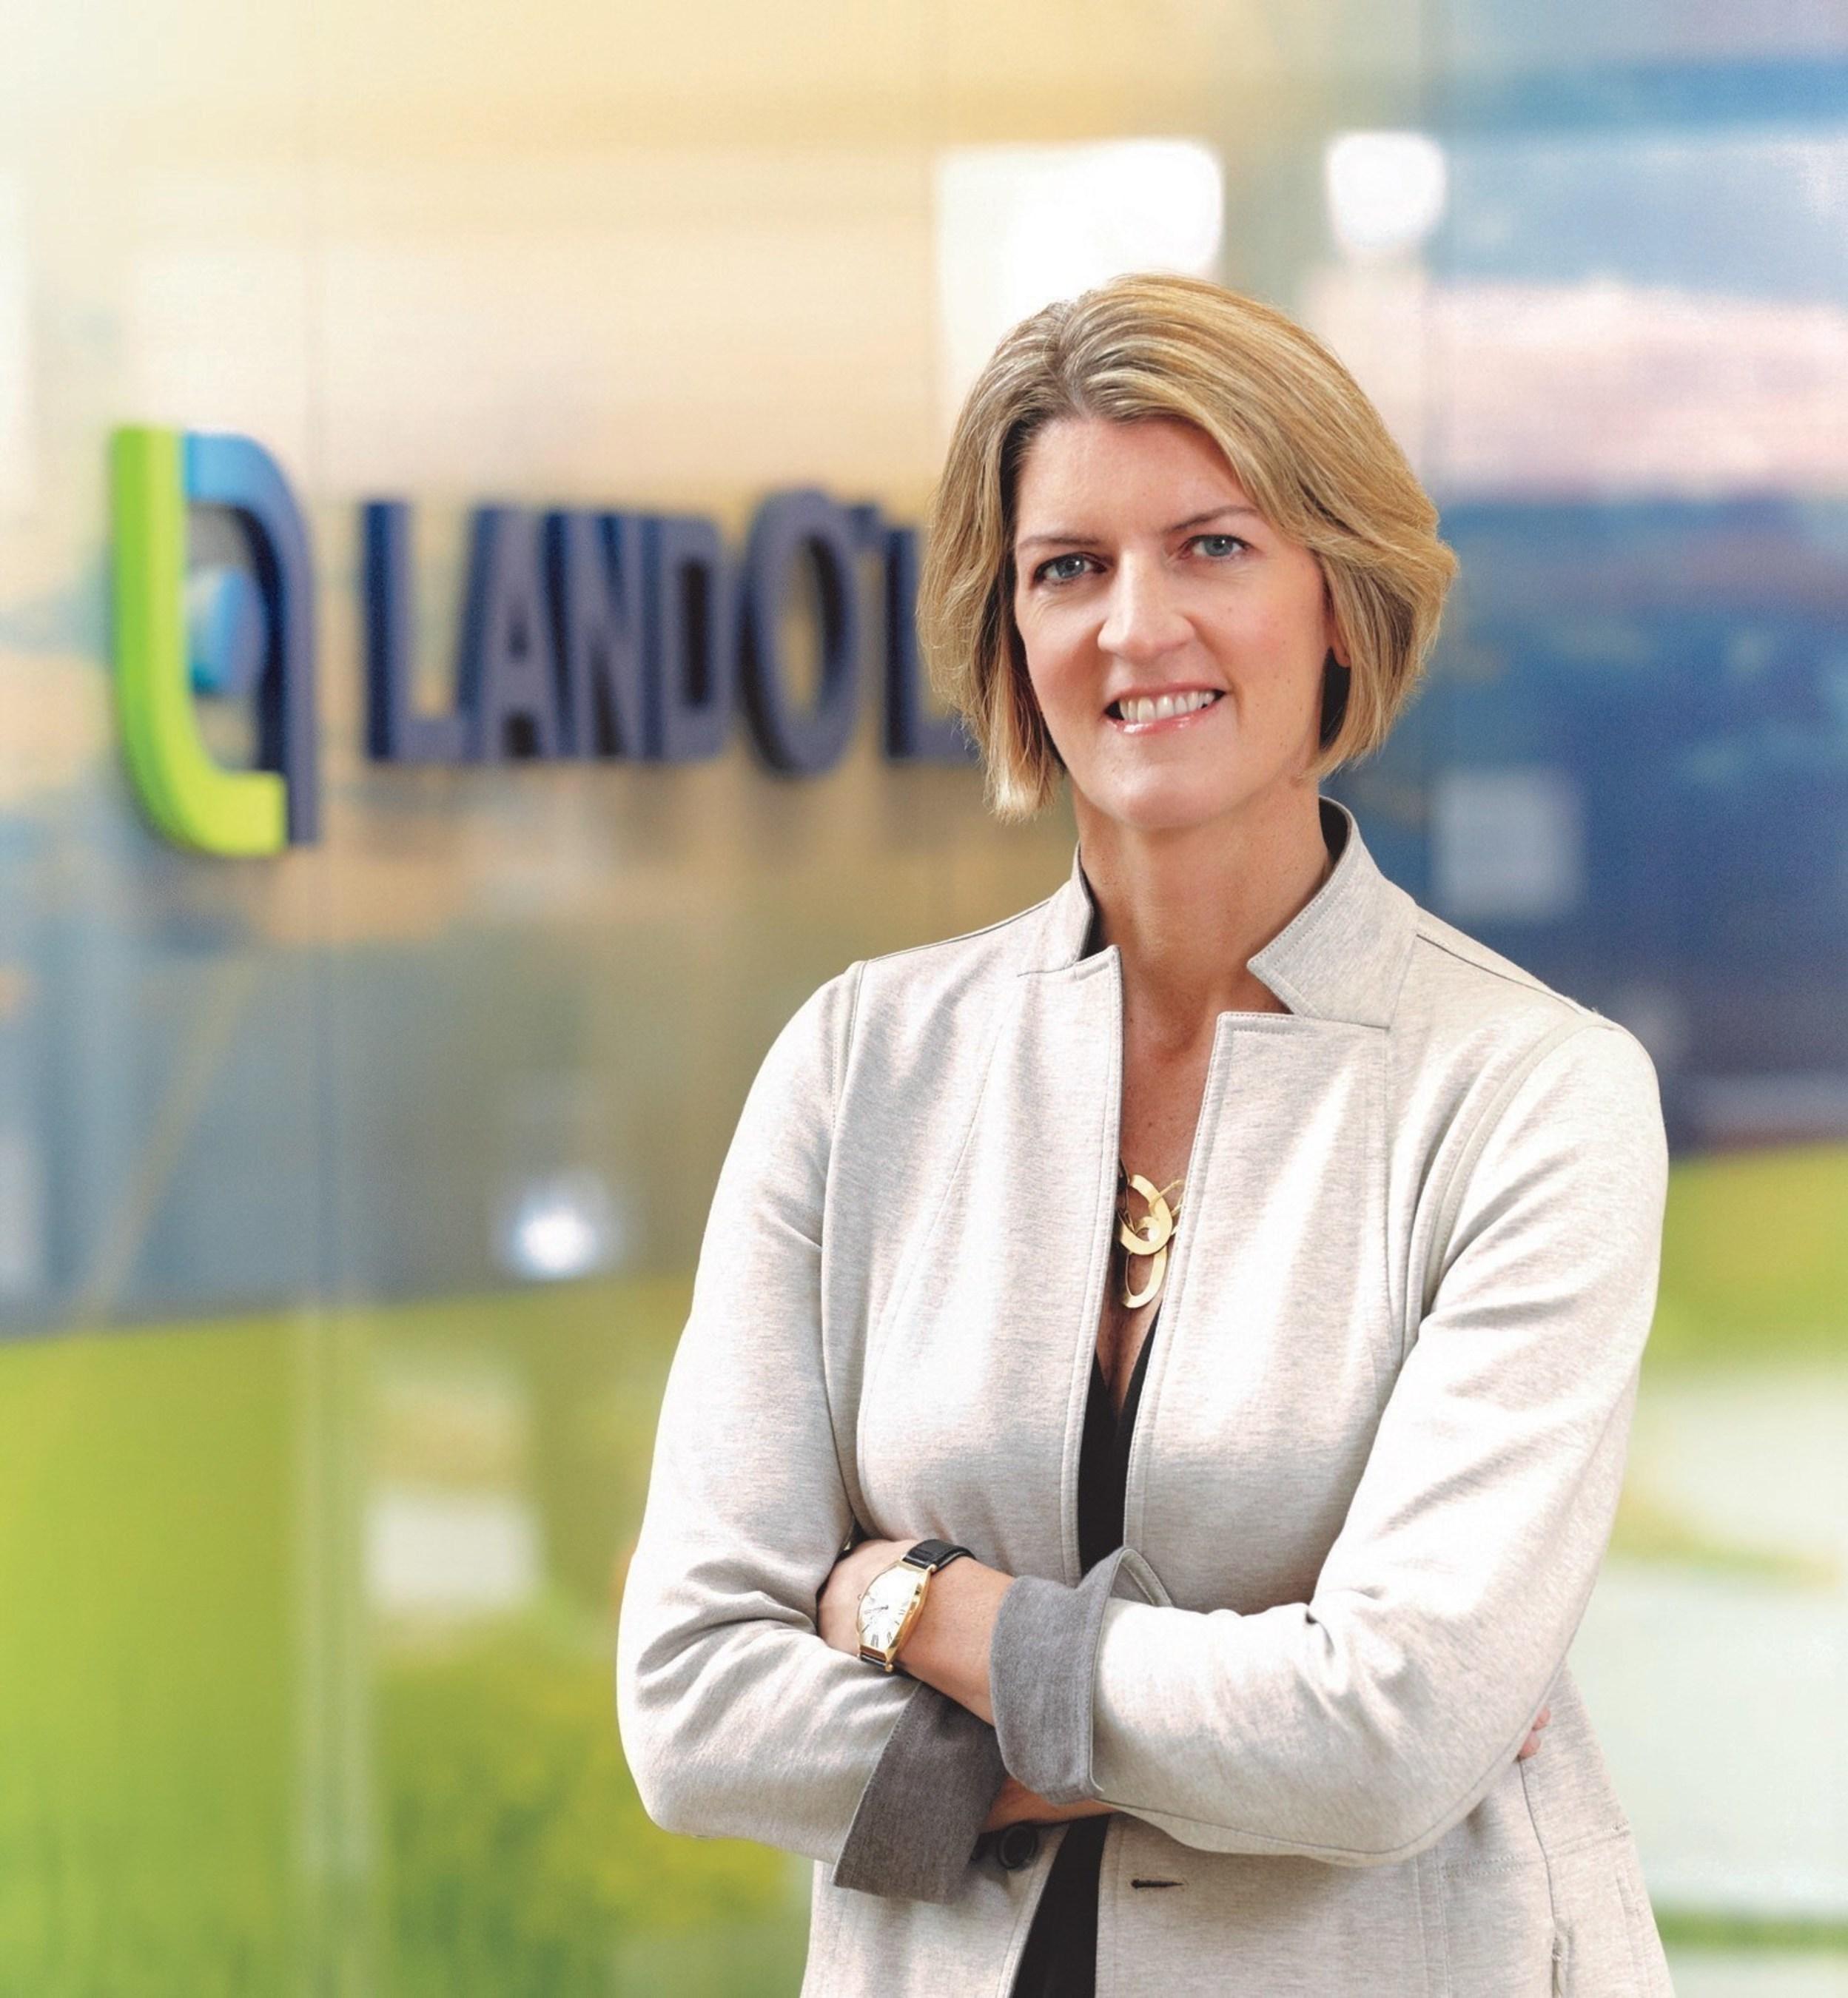 Land O'Lakes, Inc. Employee Beth Ford